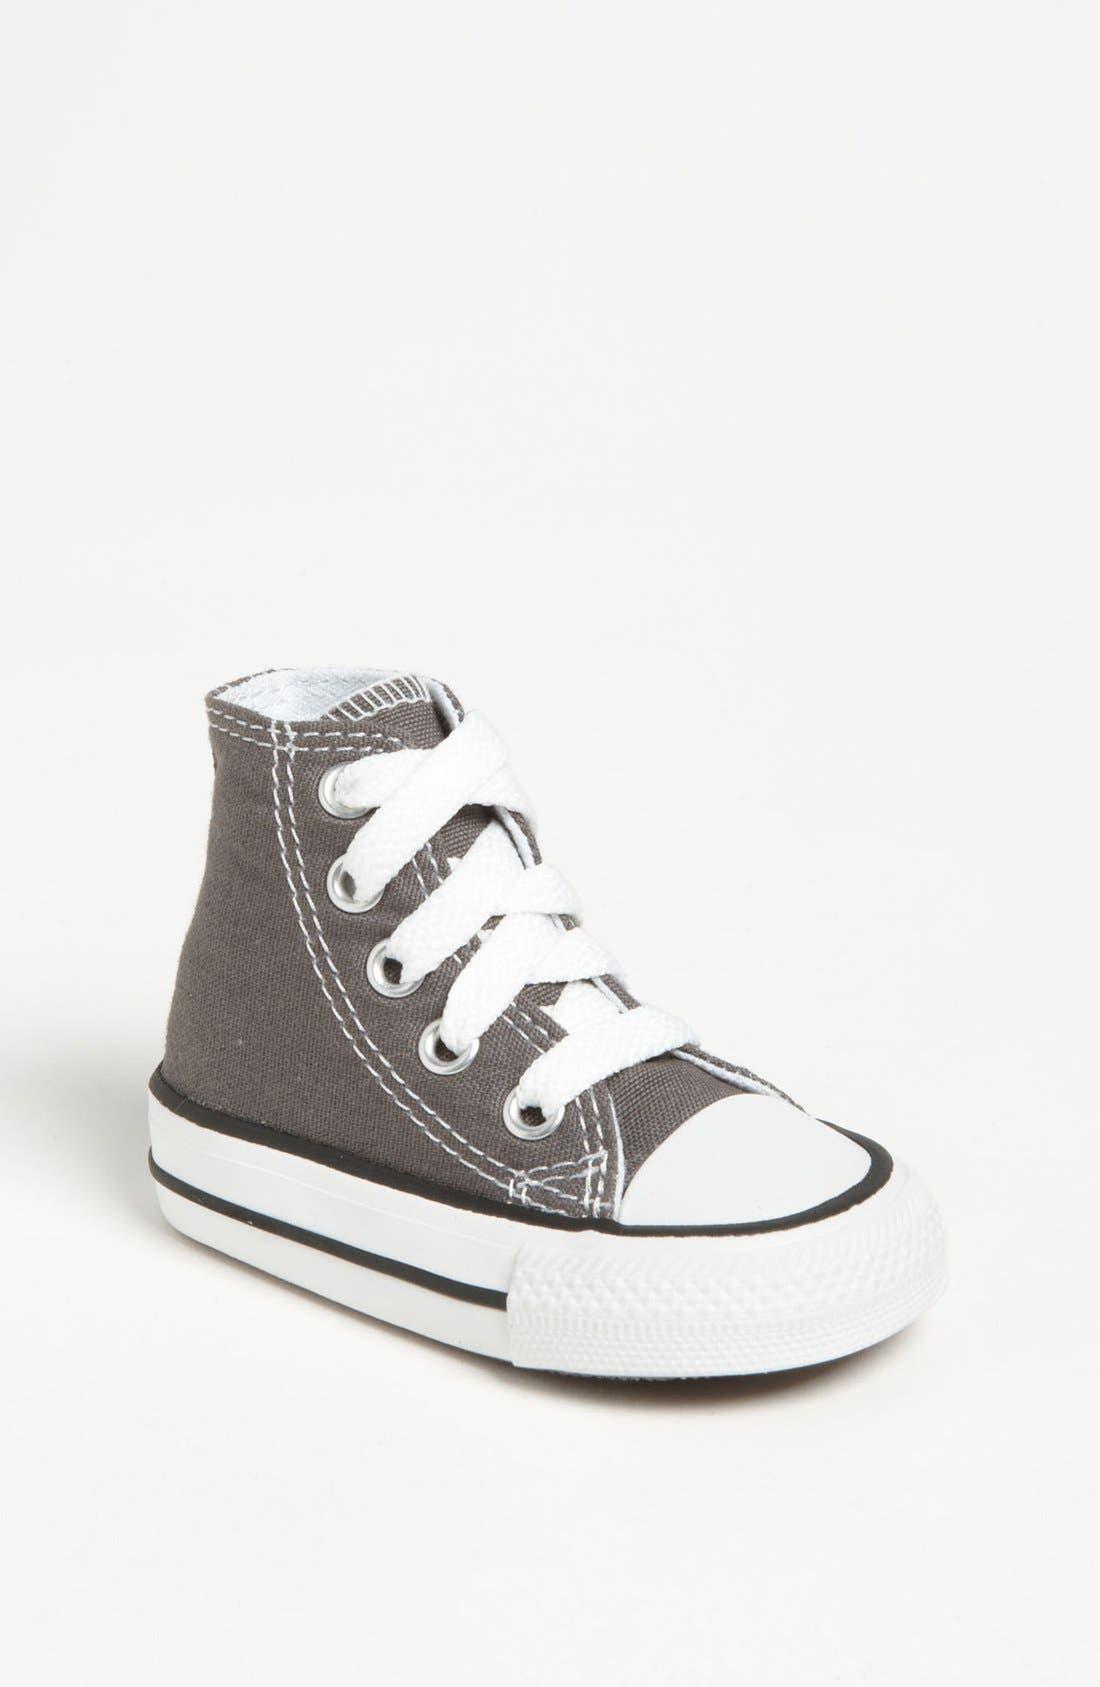 Converse All Star High Top Sneaker